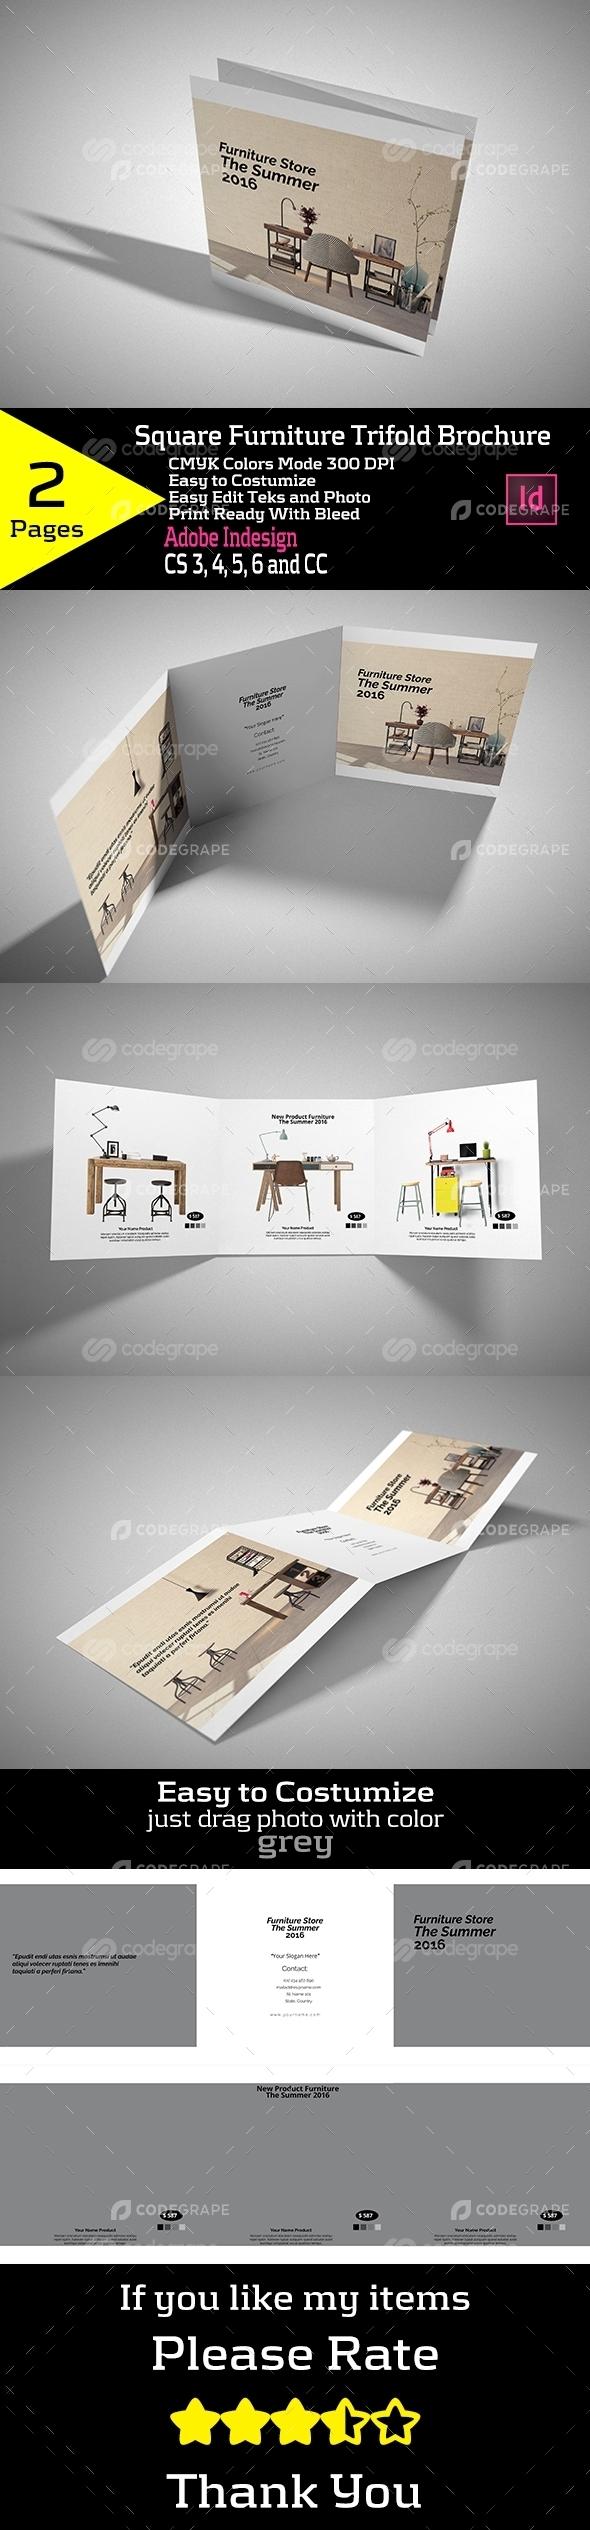 Square Furniture Trifold Brochure